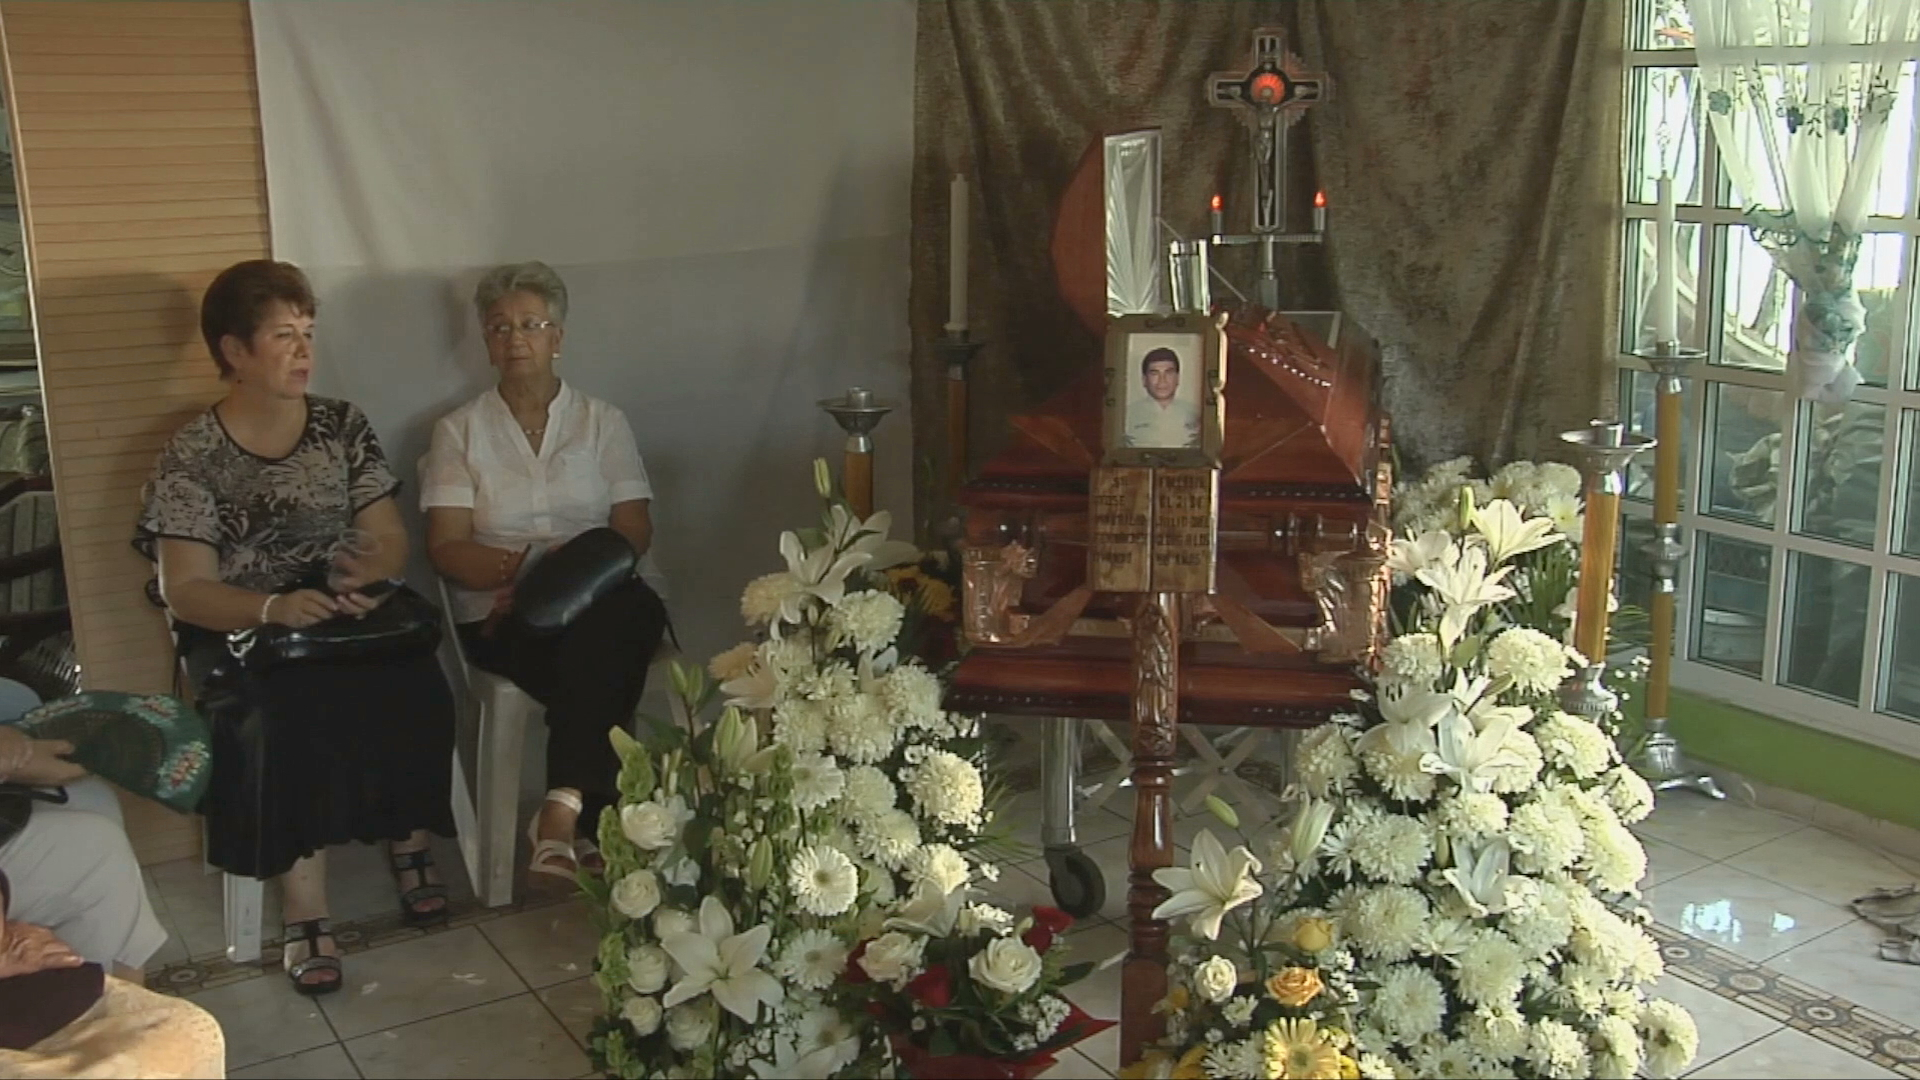 Muere el ex presidente municipal de Medellín, Maurilio Fernández